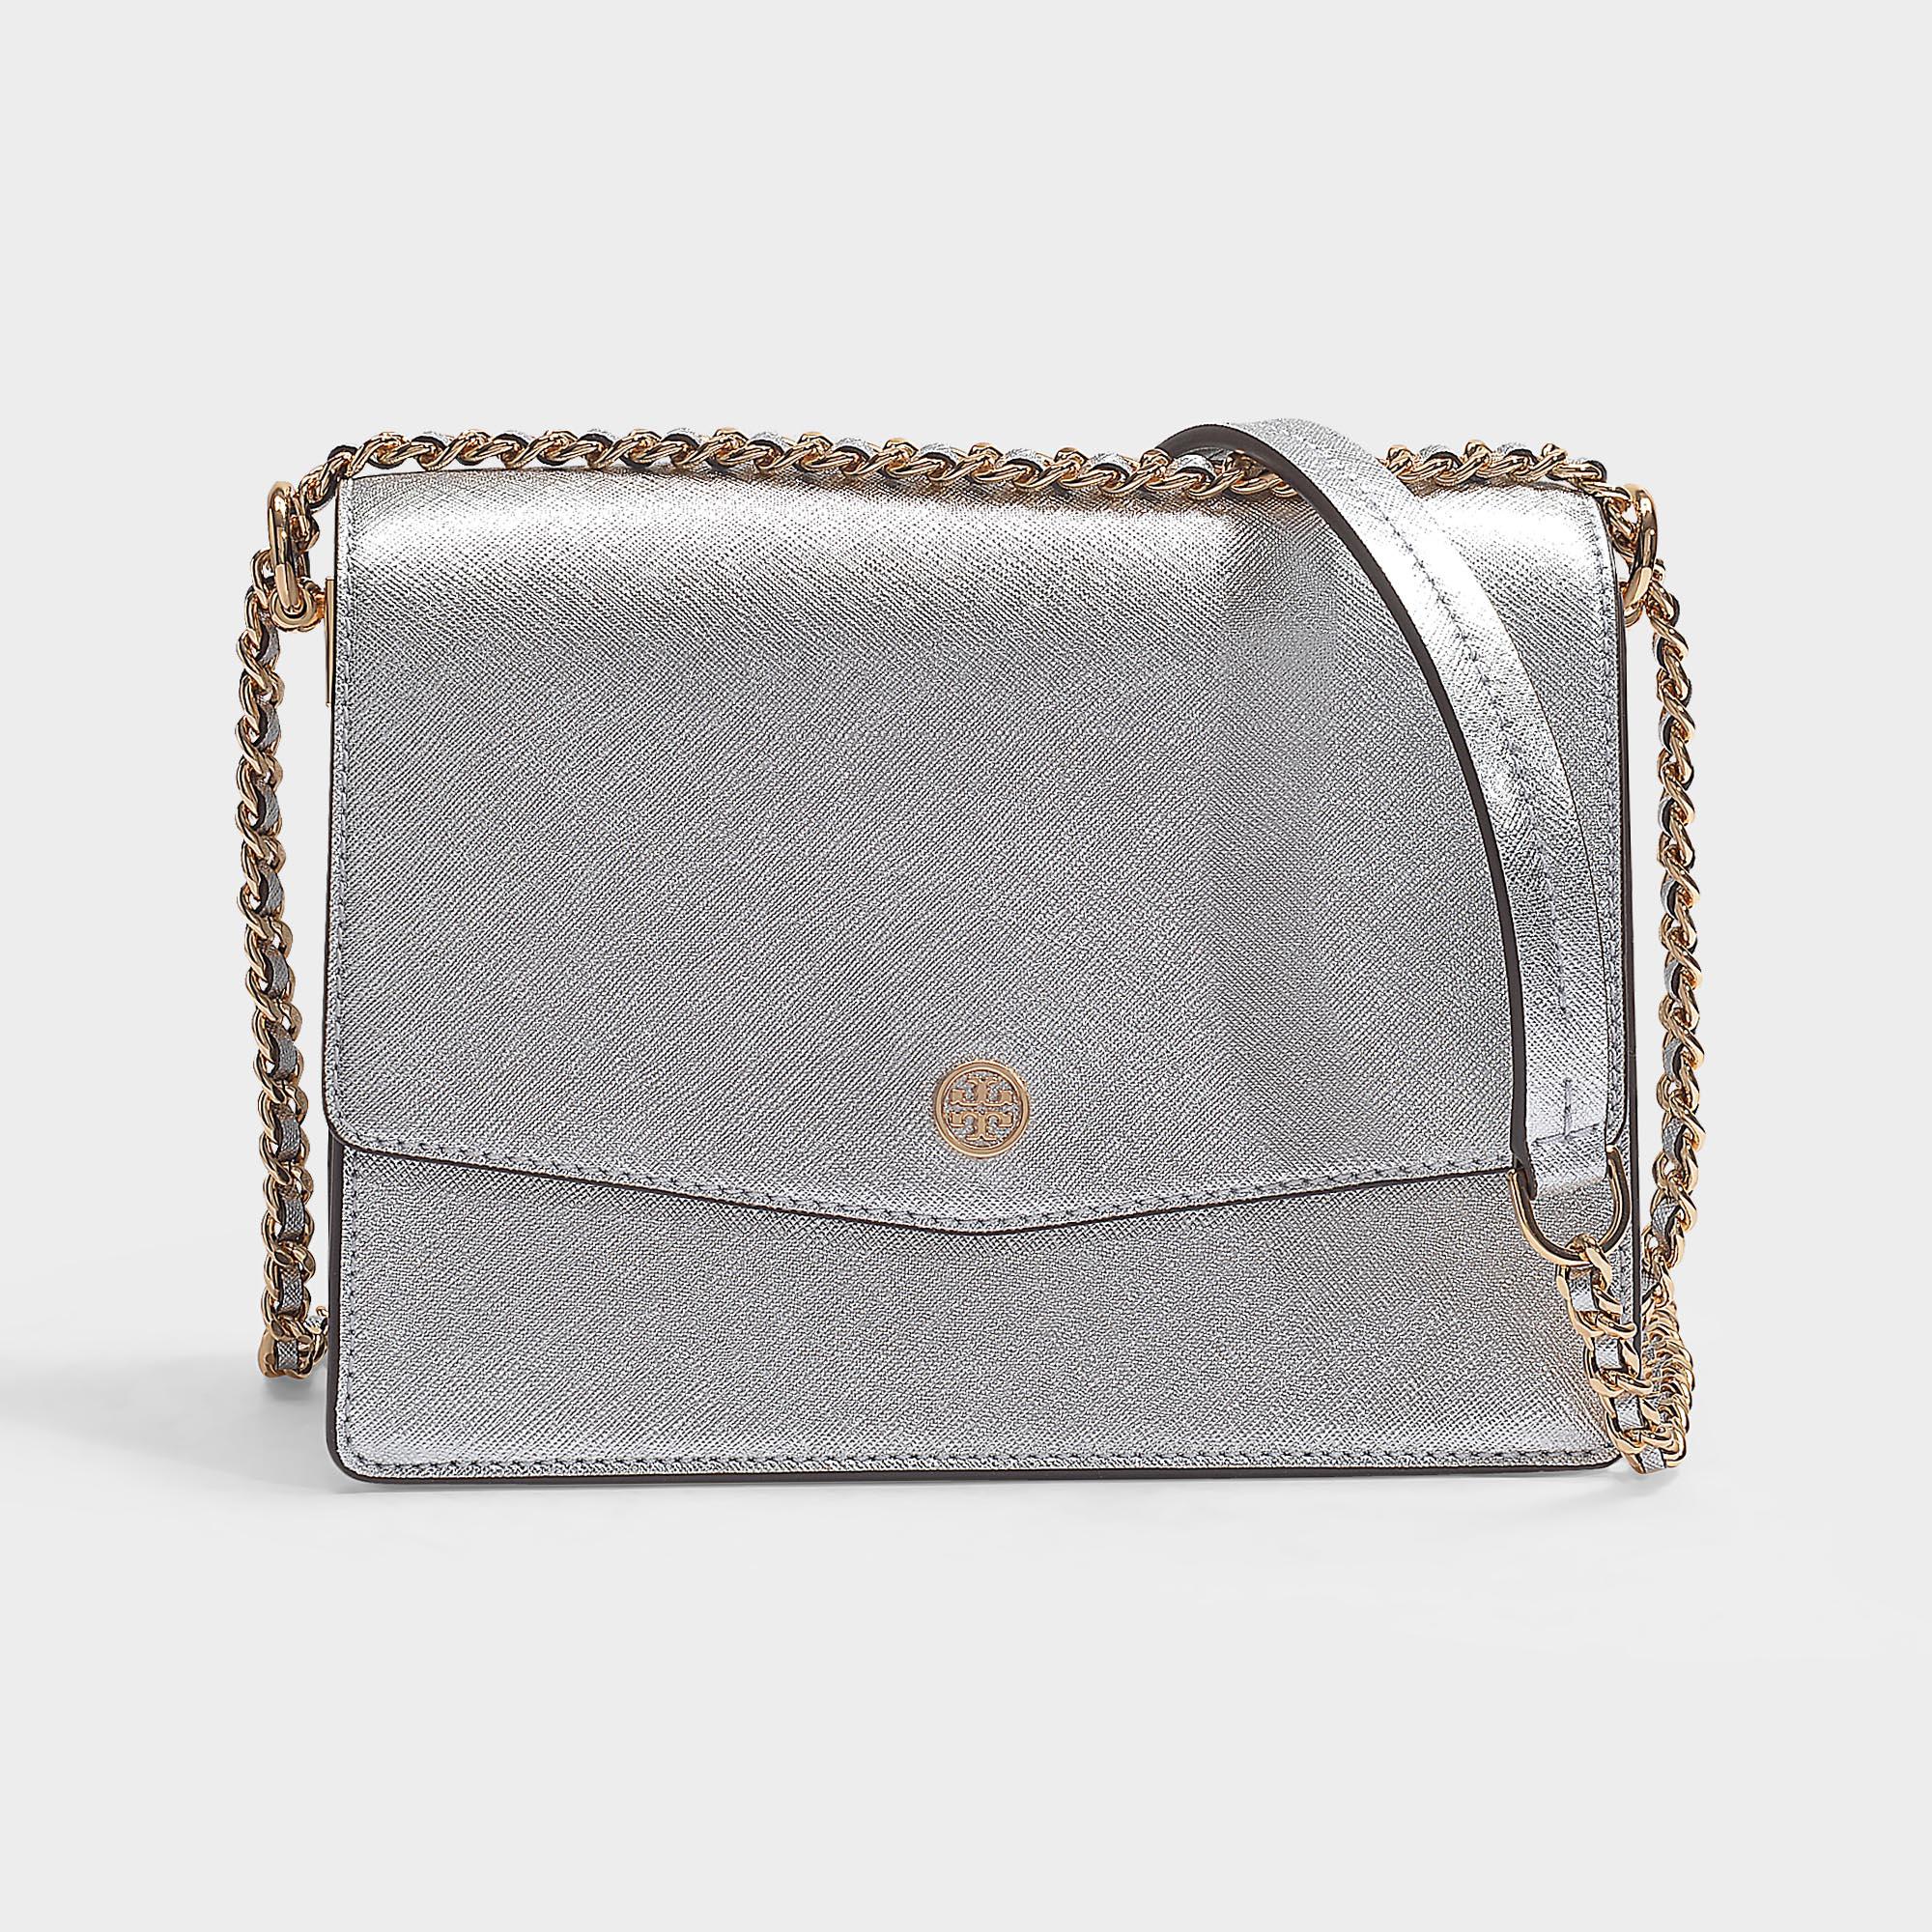 e587b8d7d80 Tory Burch Robinson Metallic Mini Shoulder Bag, Silver | ModeSens